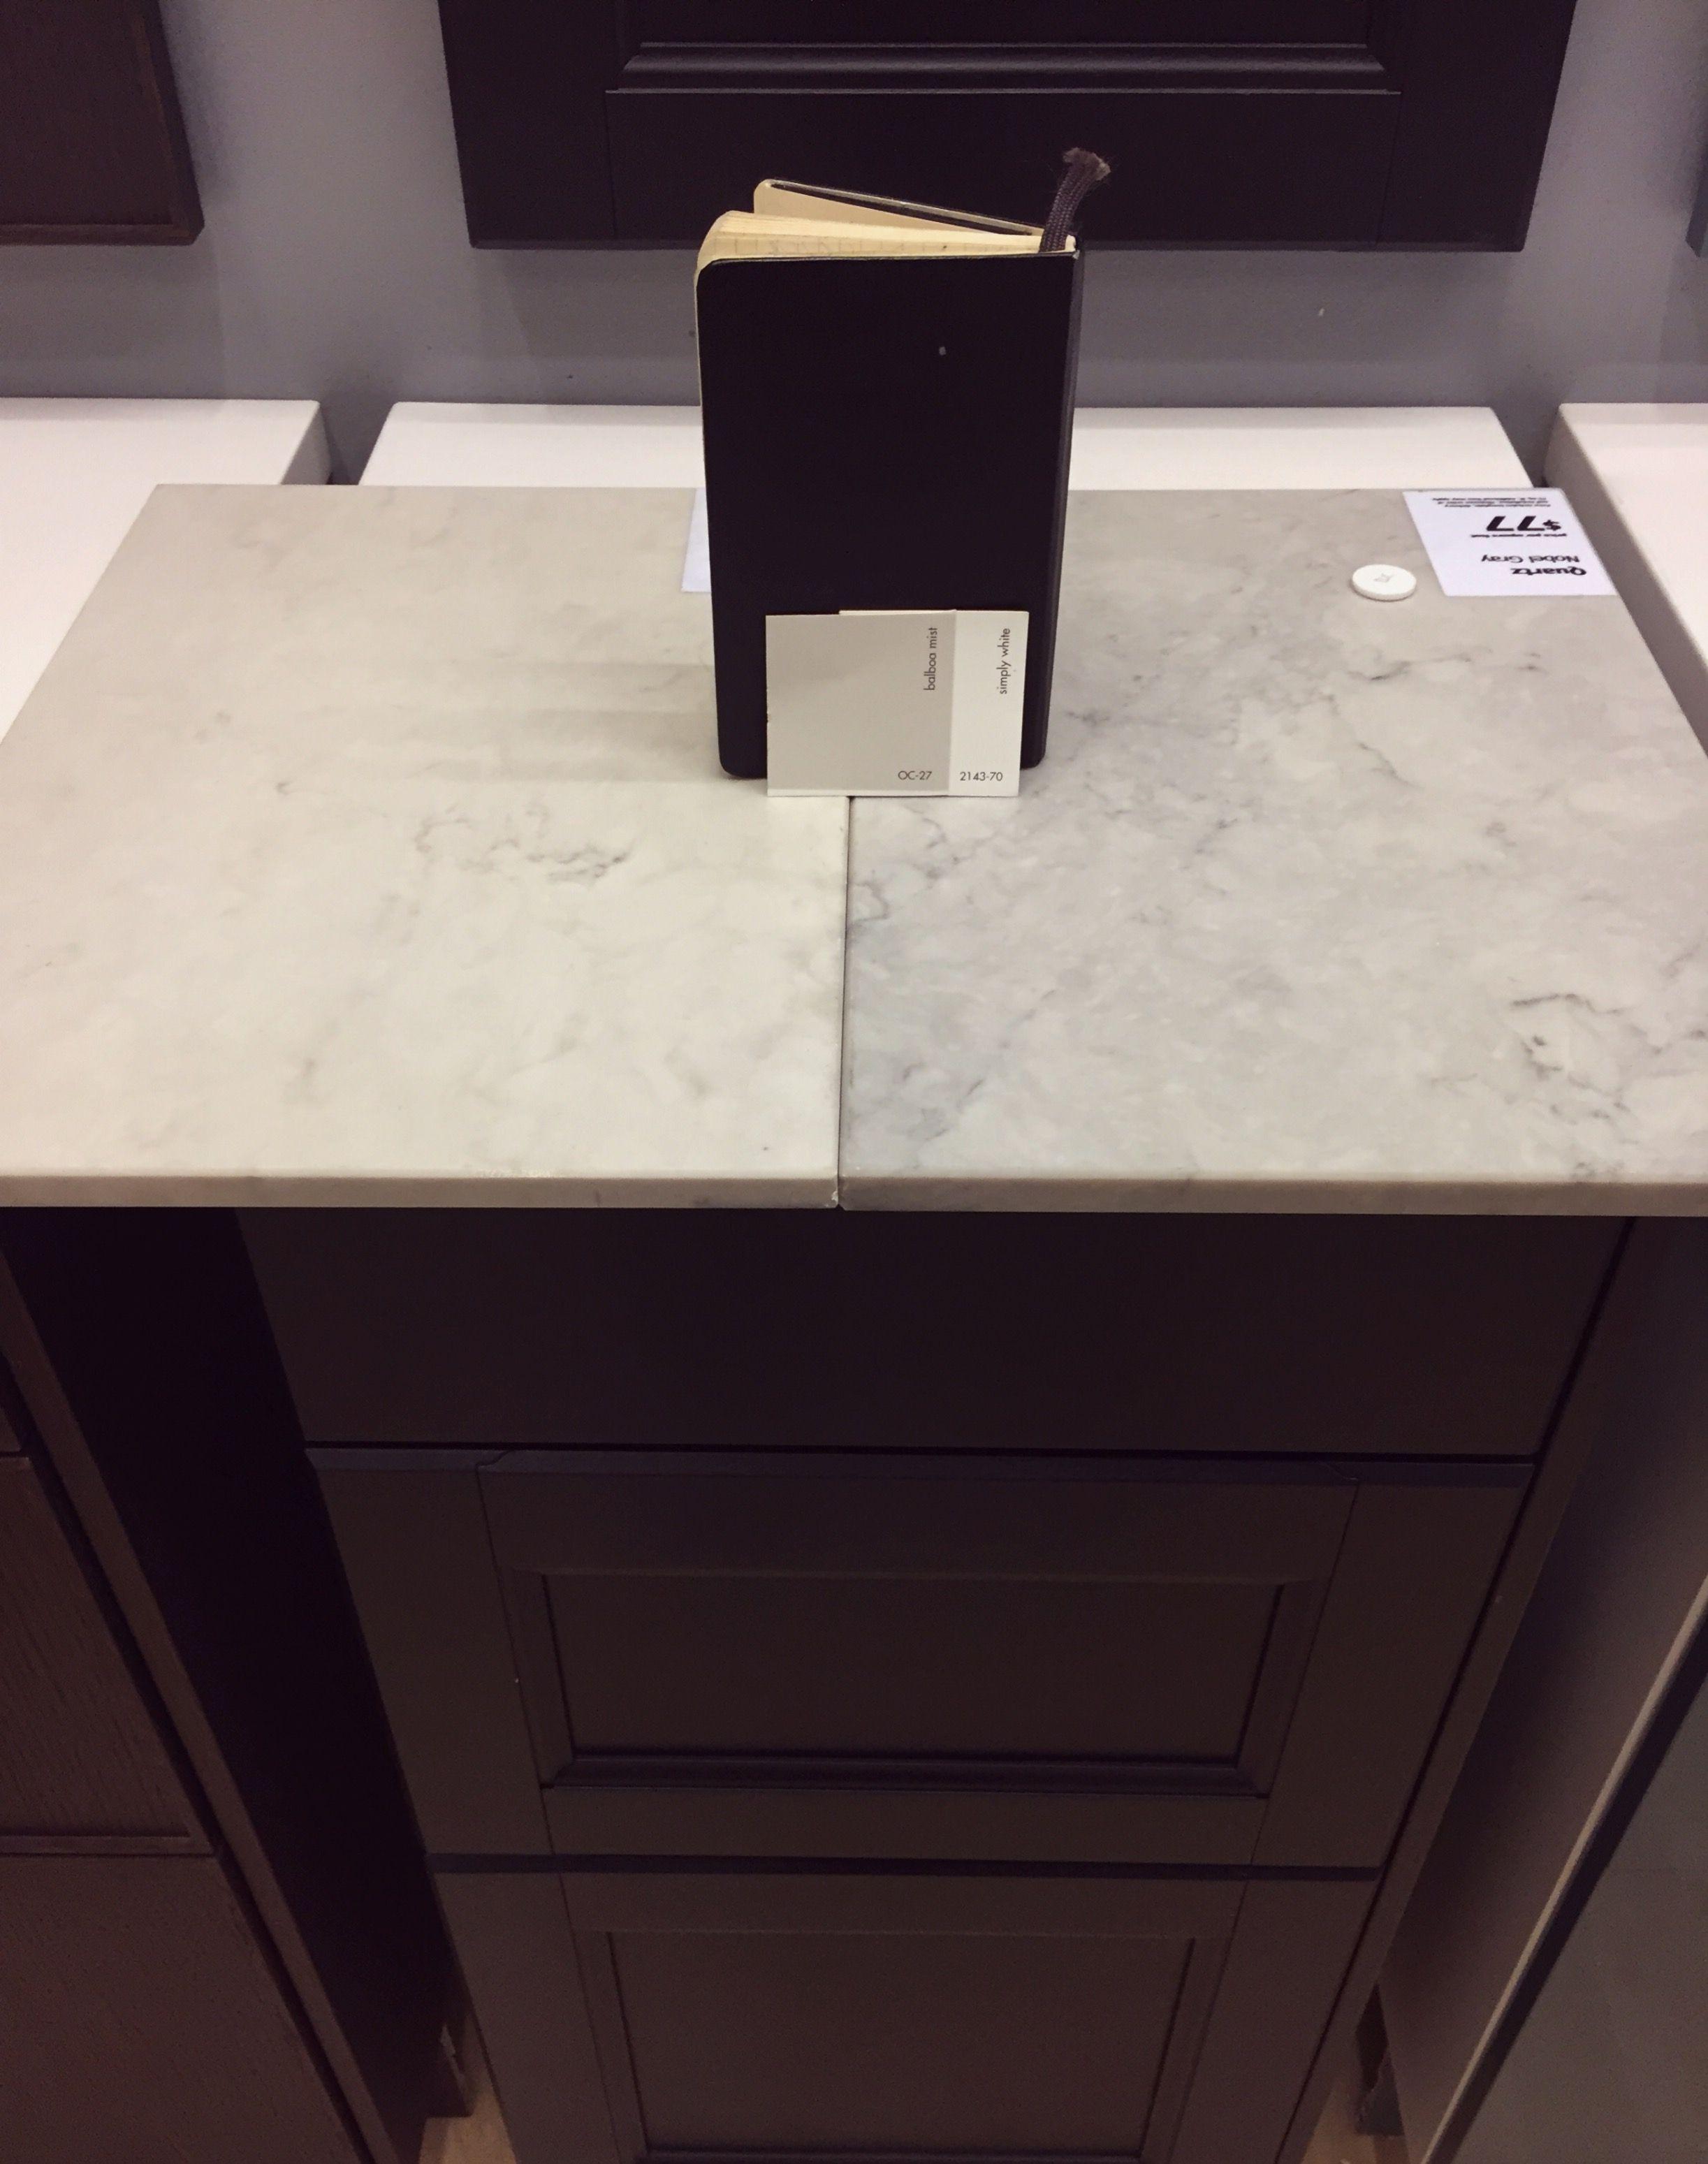 Caesarstone Countertop Options At Ikea London Grey Vs